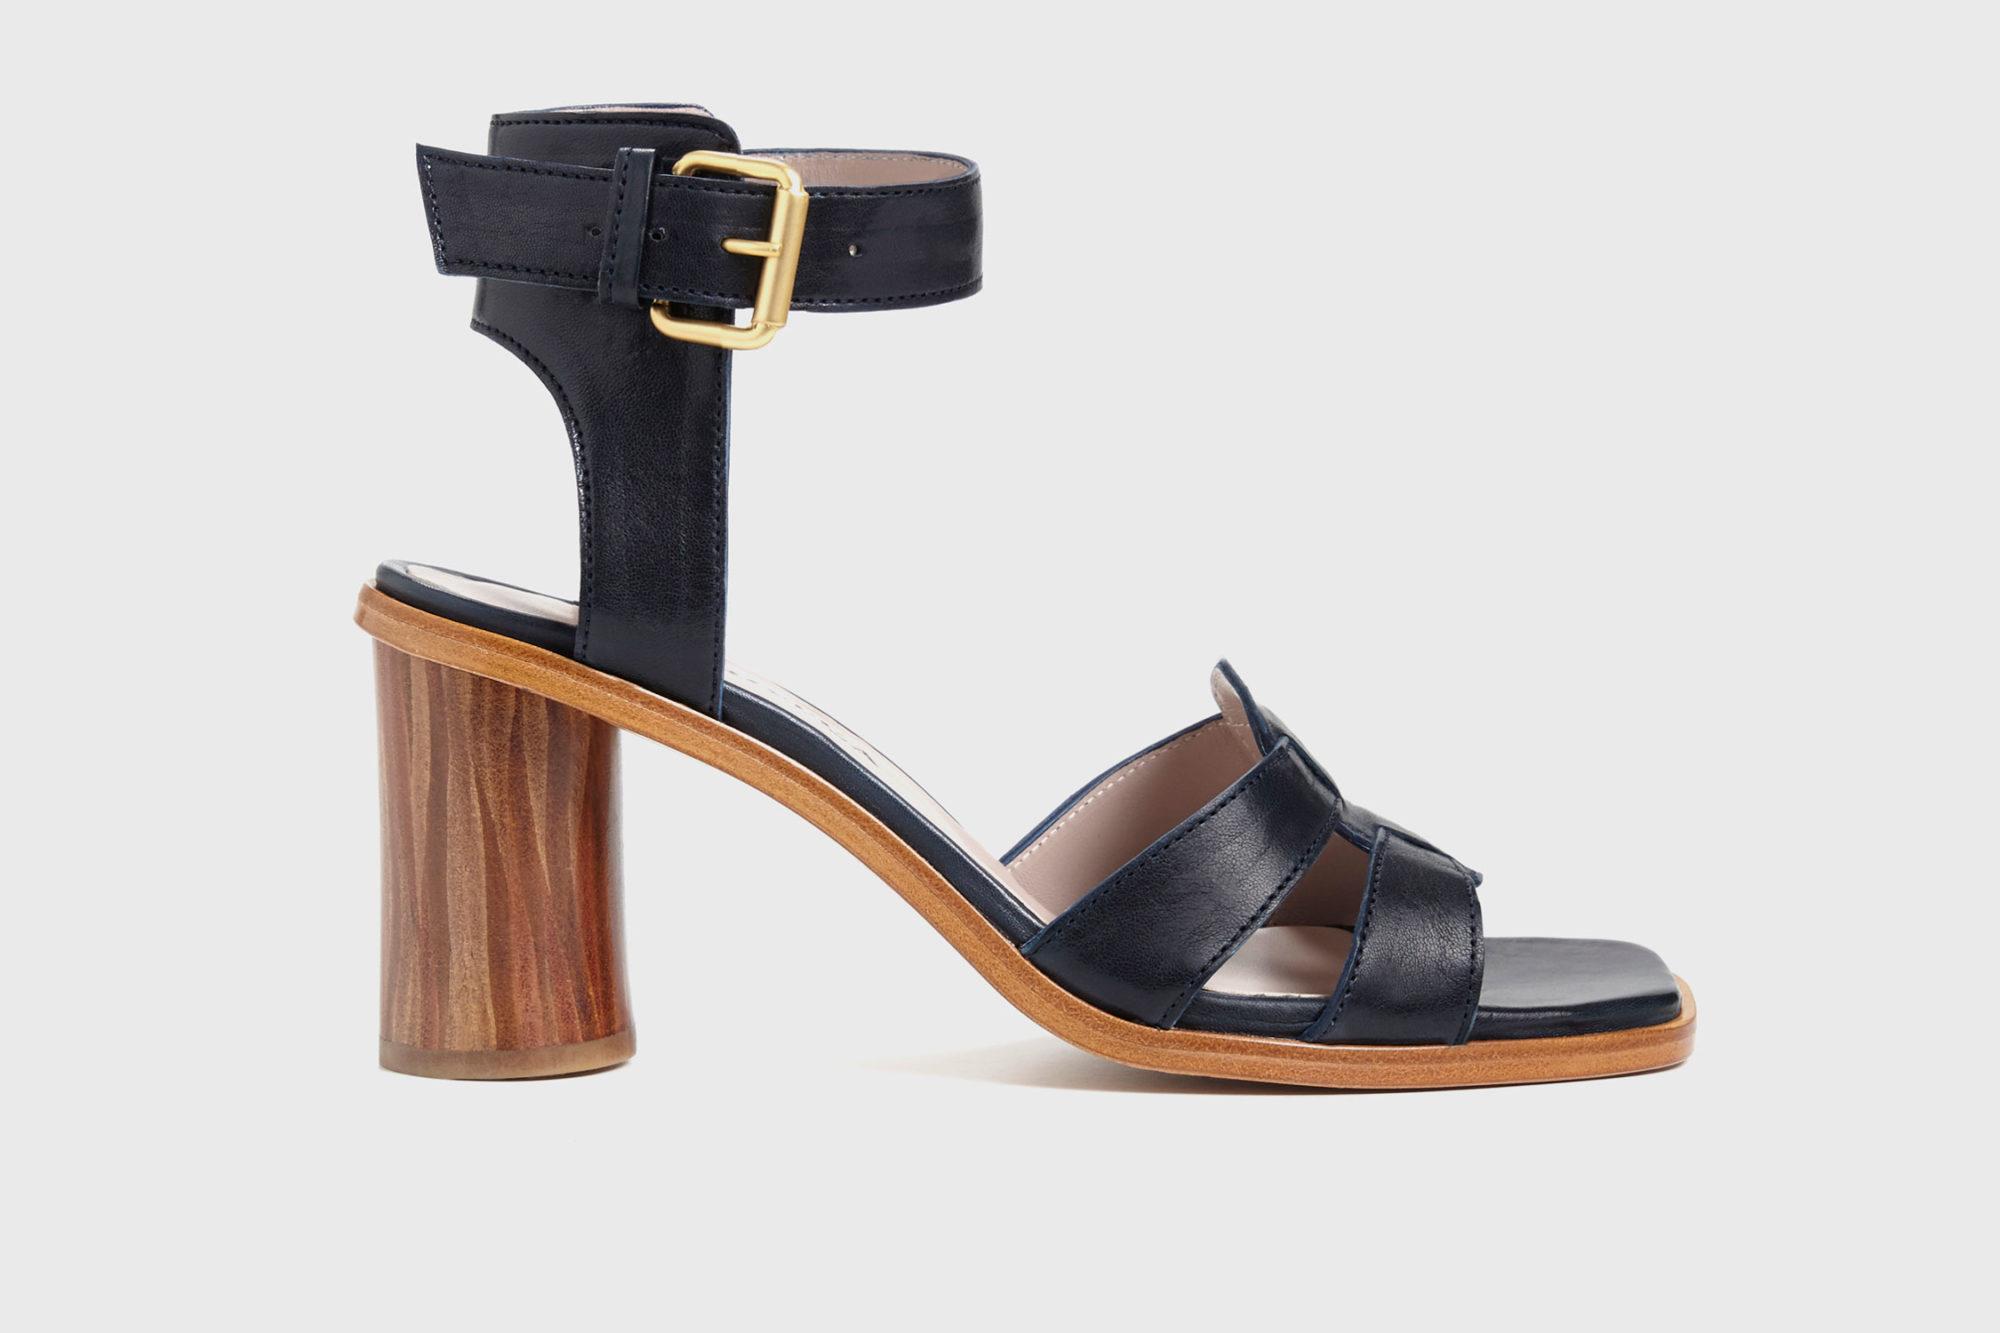 Dorotea sandalia de tacón alto Lianne azul marino ss17 perfil